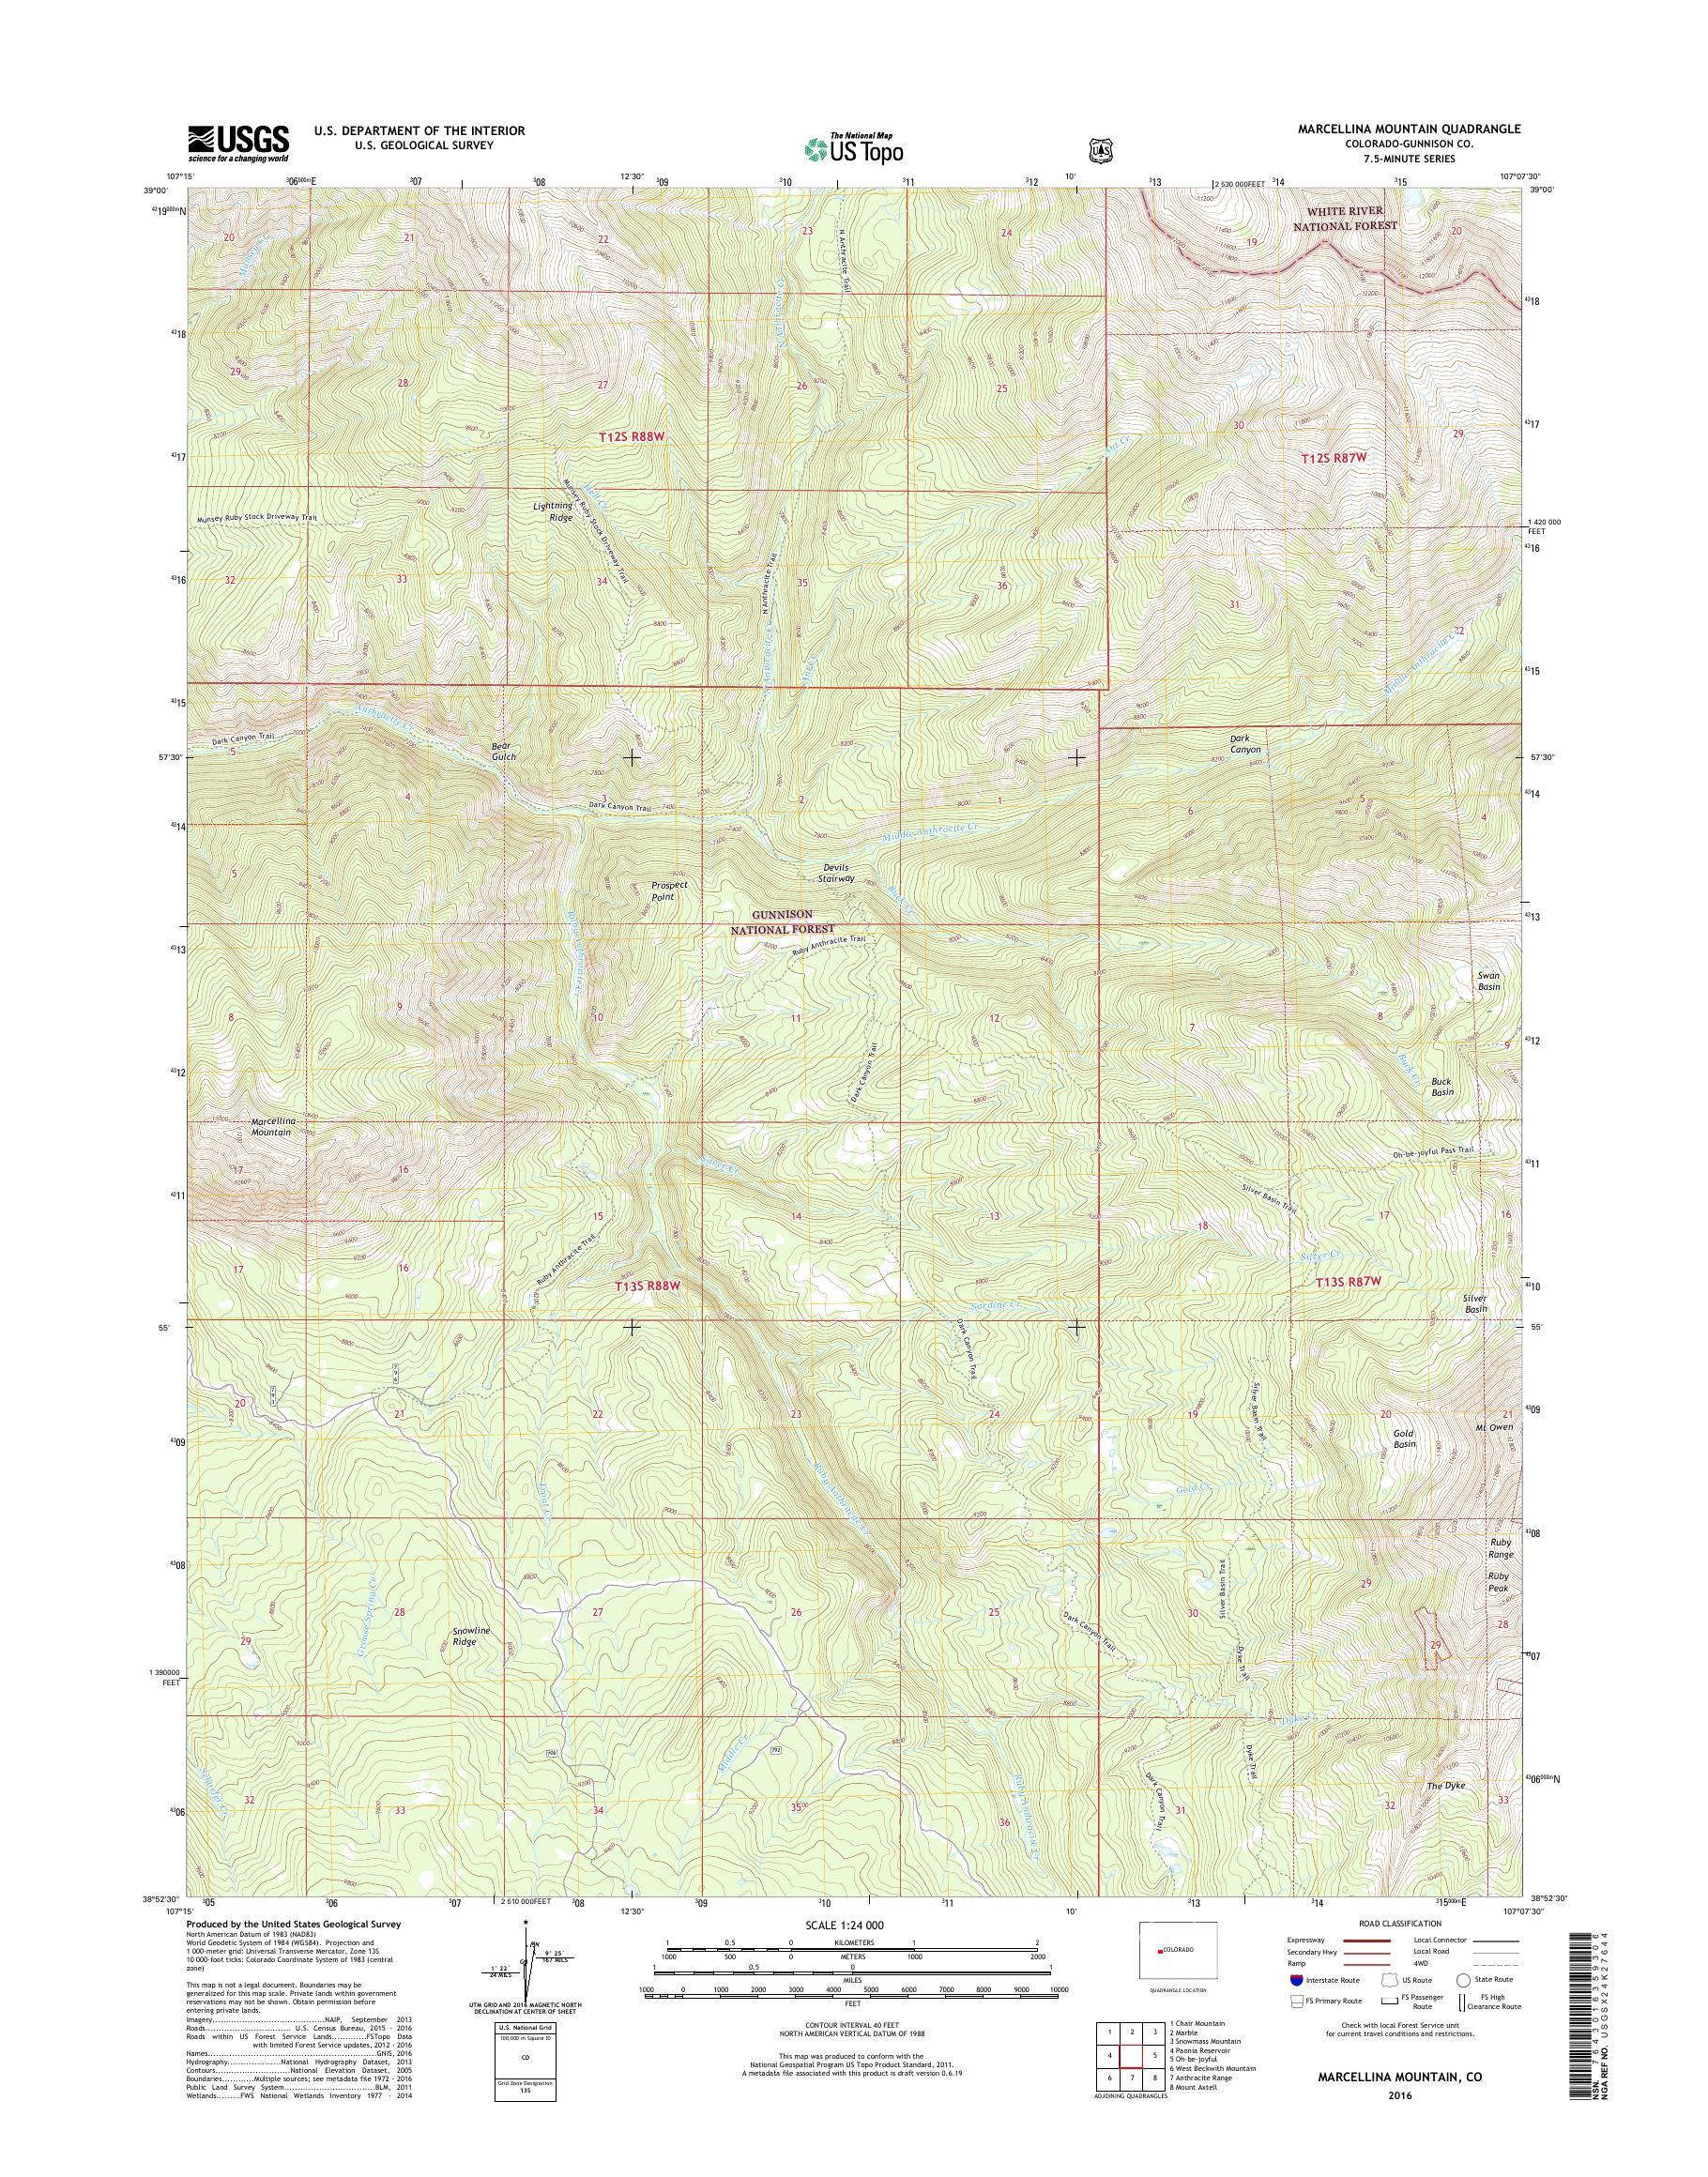 Mytopo Marcellina Mountain Colorado Usgs Quad Topo Map - Topographic-map-of-us-mountain-ranges